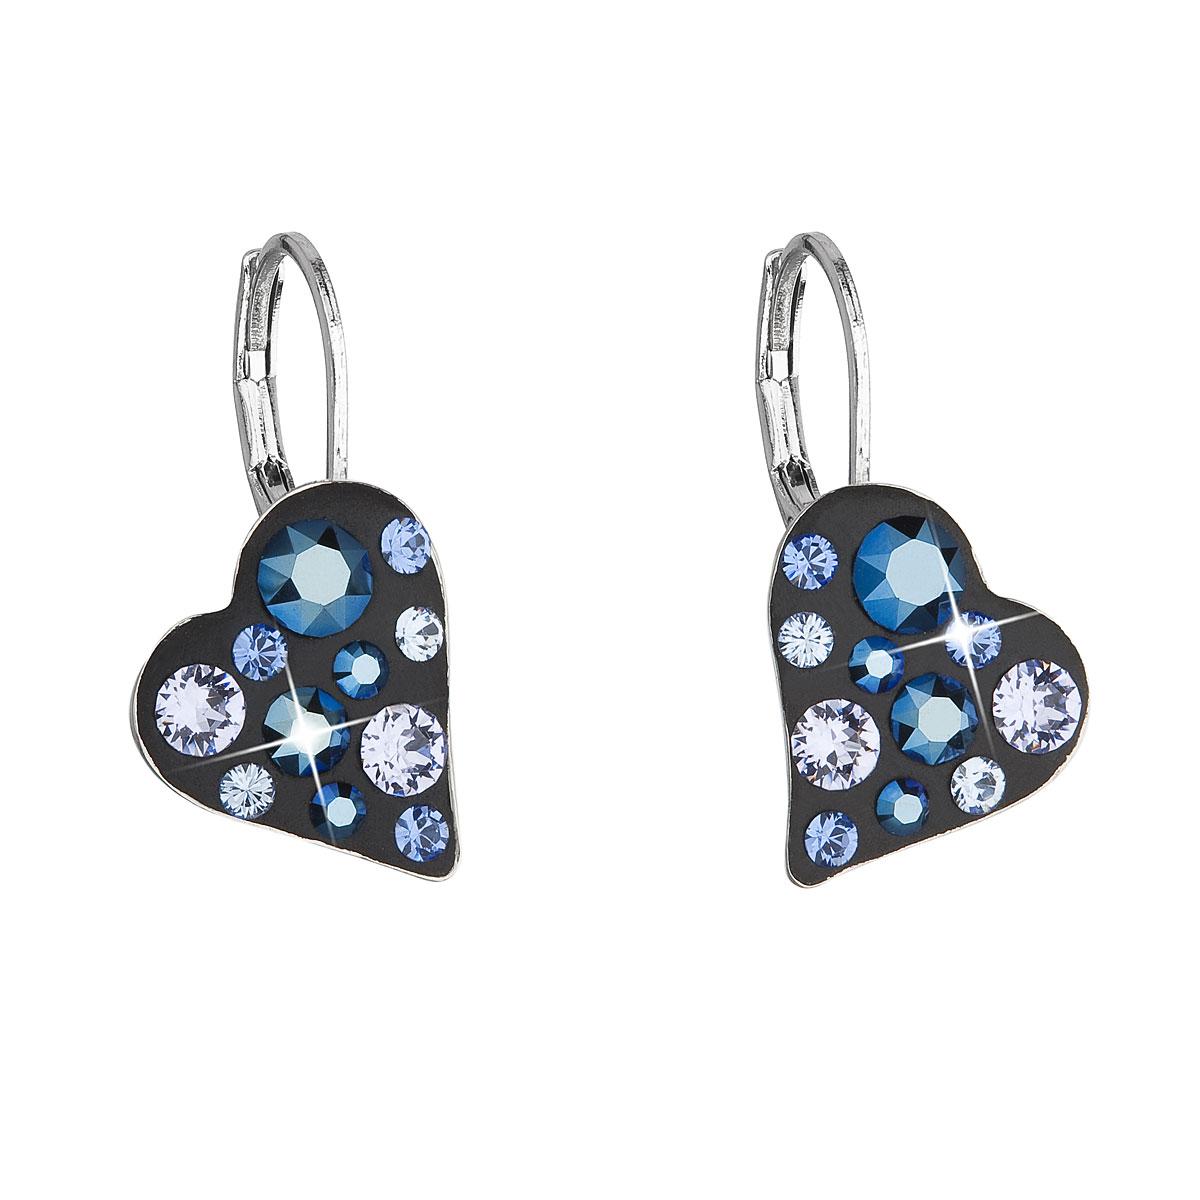 Náušnice bižutéria so Swarovski krištáľmi modré srdce 51043.5 metalic blue